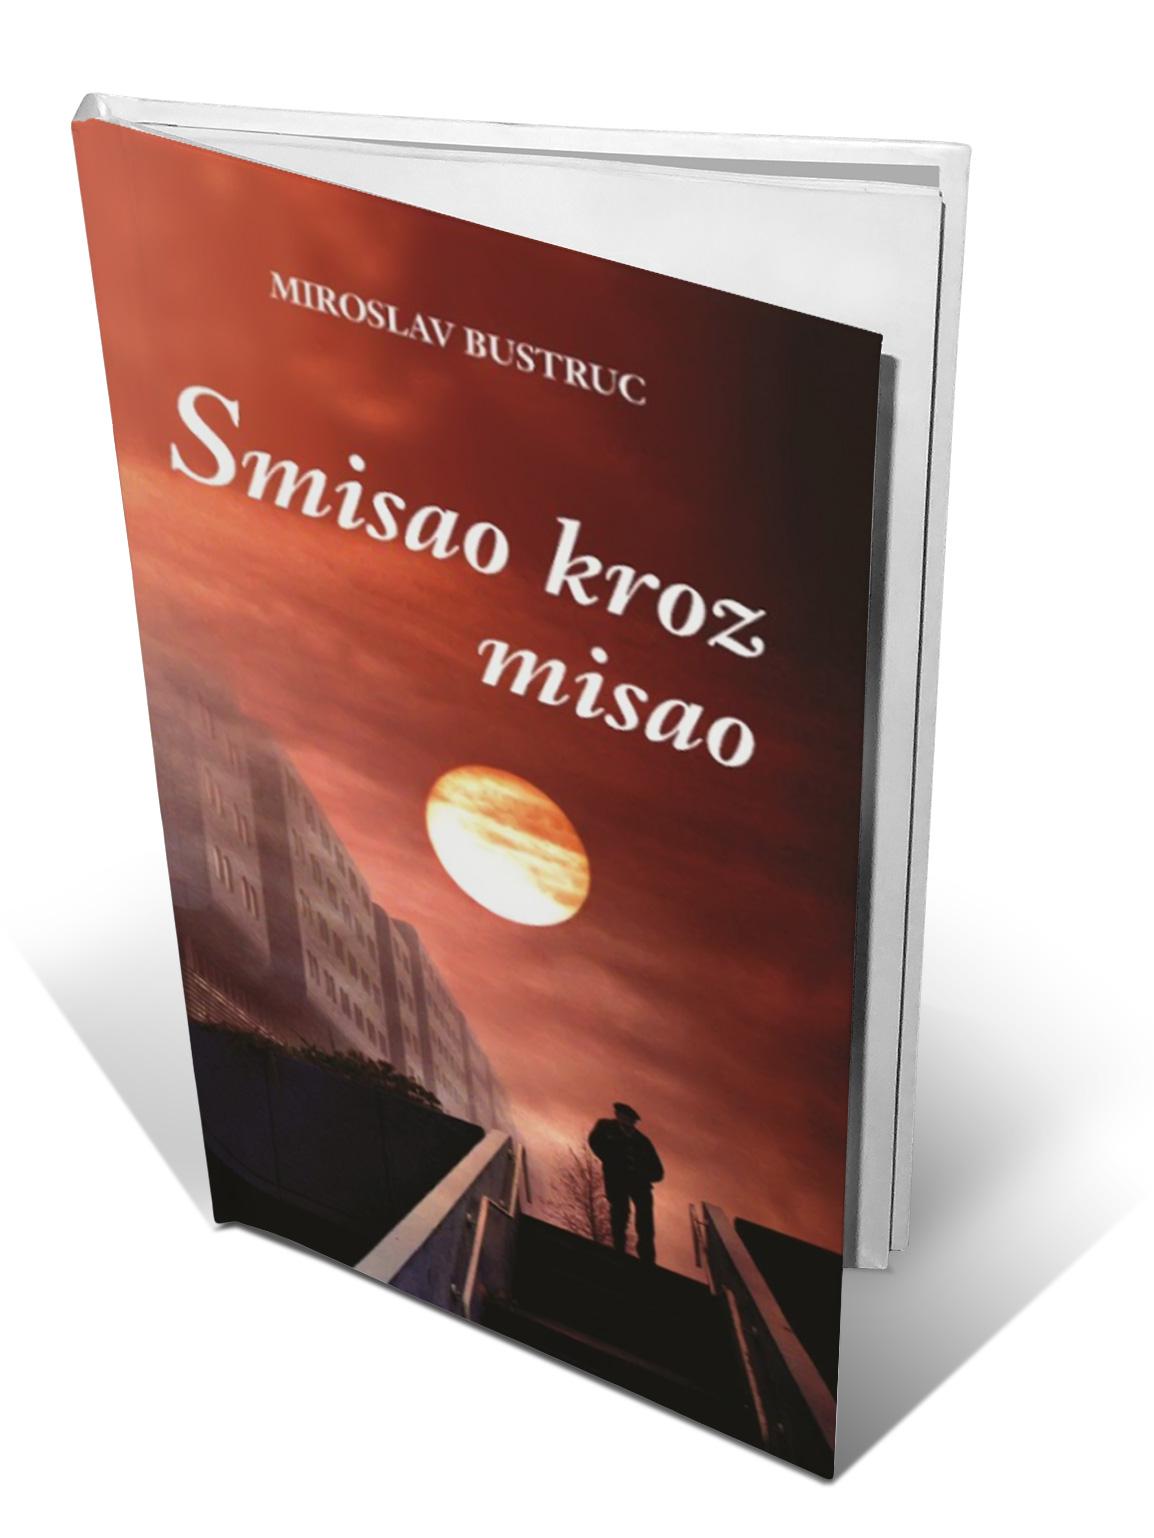 SMISAO KROZ MISAO - Miroslav Bustruc